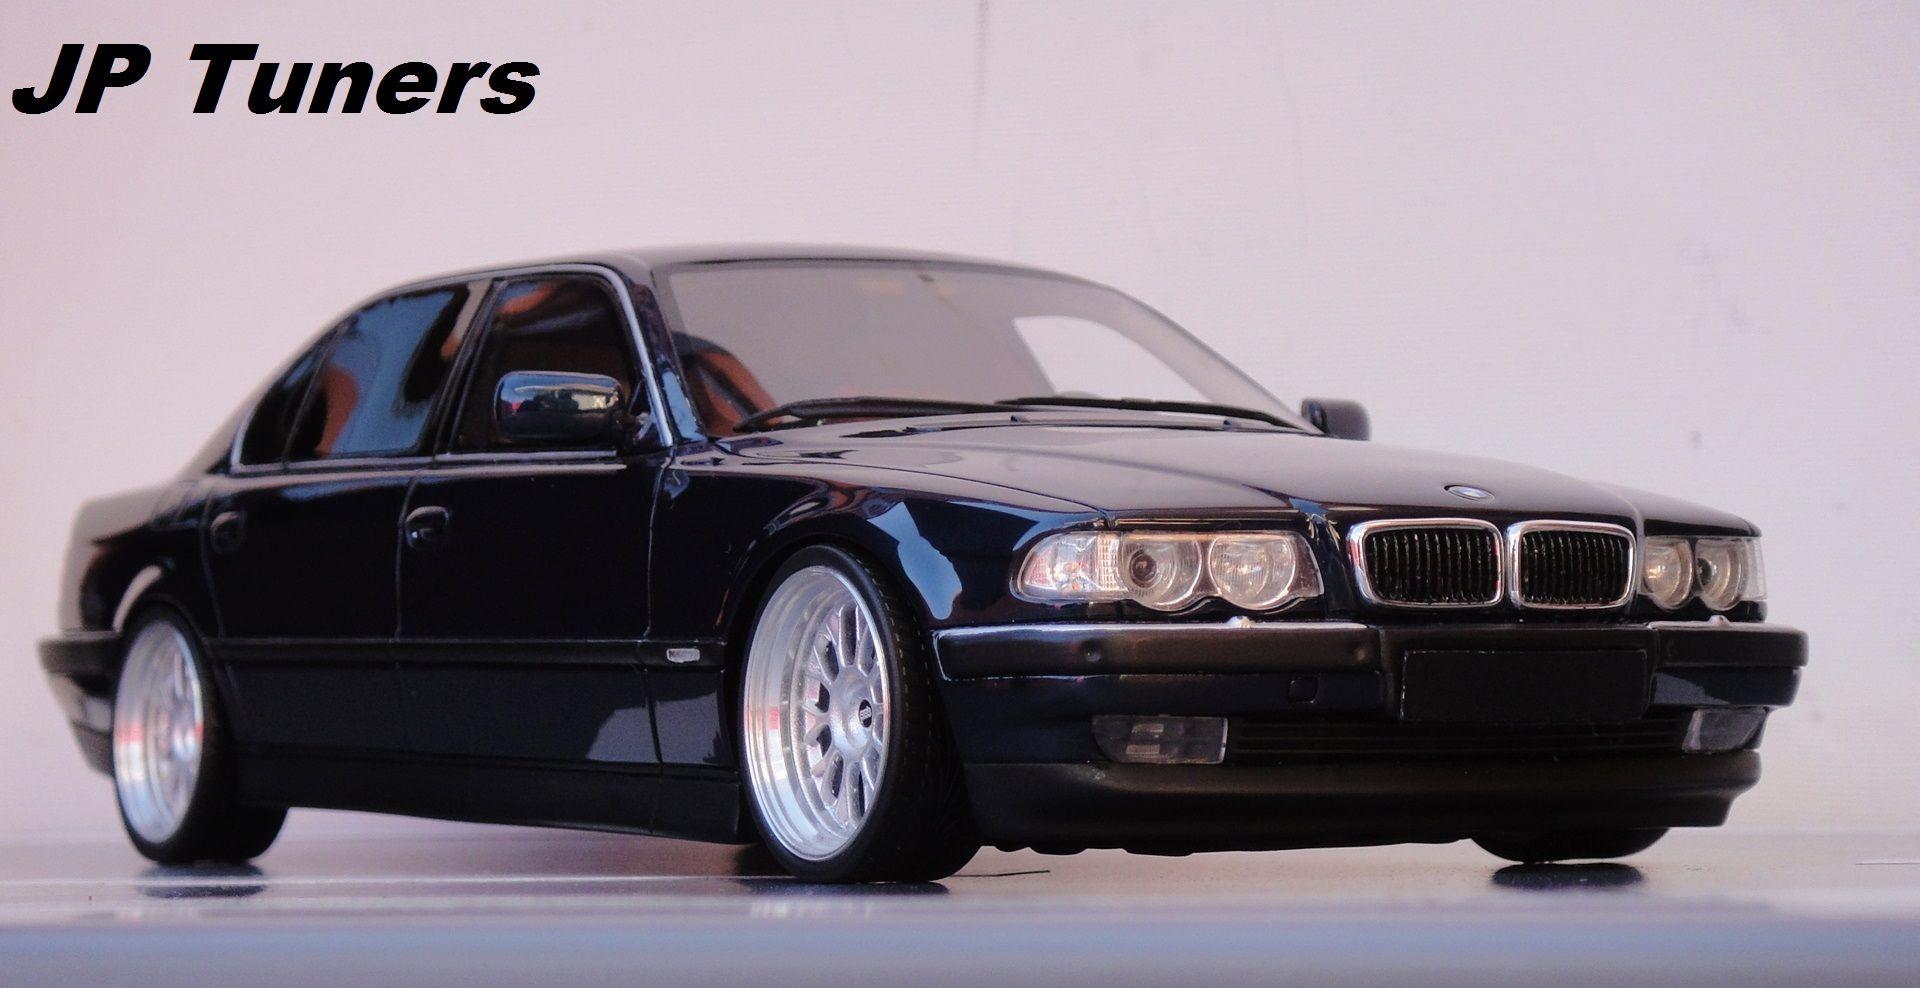 1 18 Bmw 750 Il Jp Tuners Modele 1 24 1 18 Bmw Car Tuning I Cars